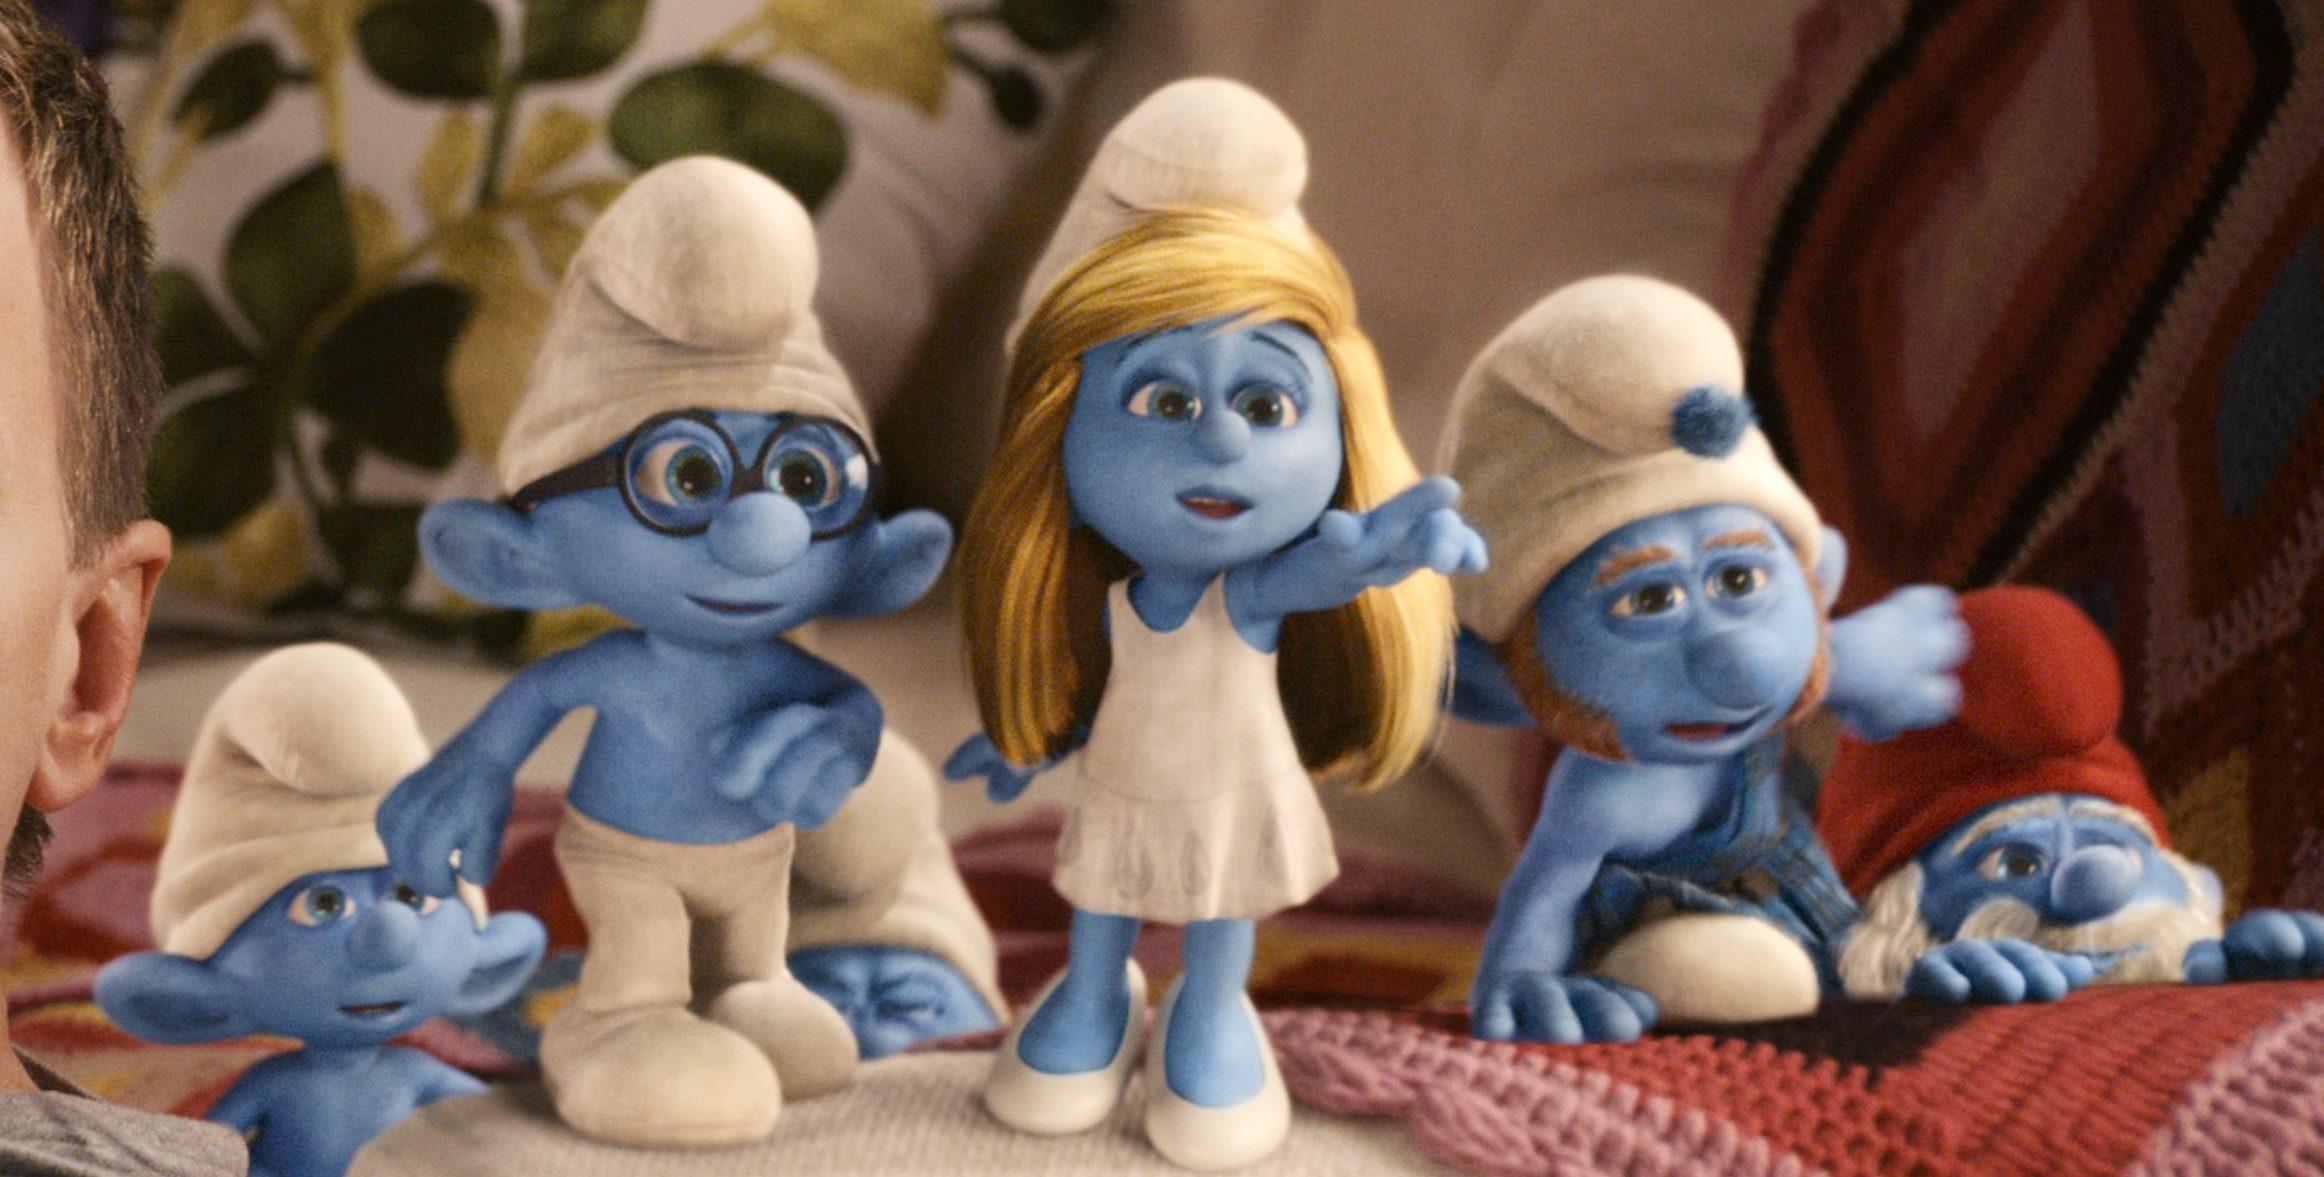 <b>The Smurfs</b>, 2011.